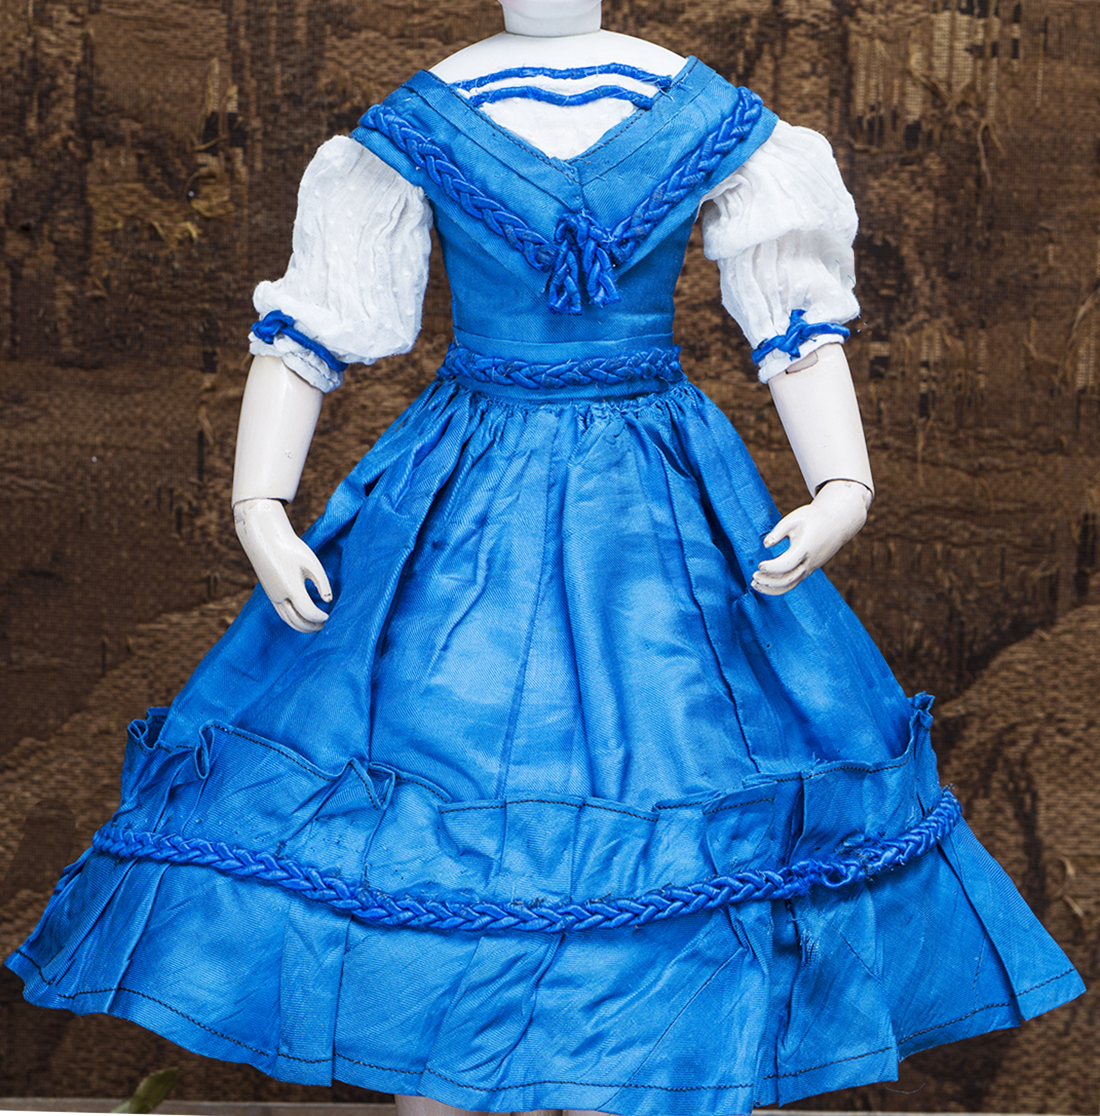 Antique doll silk dress